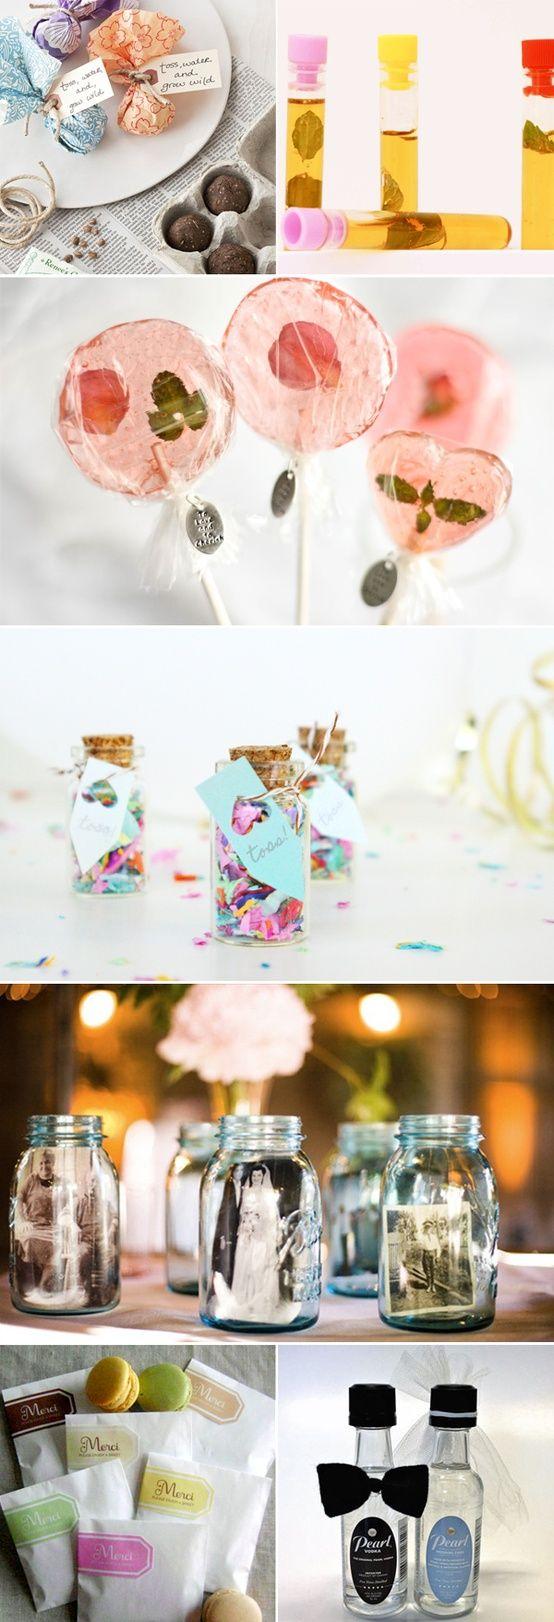 44 best Thank You Gift Ideas images on Pinterest | Teacher ...